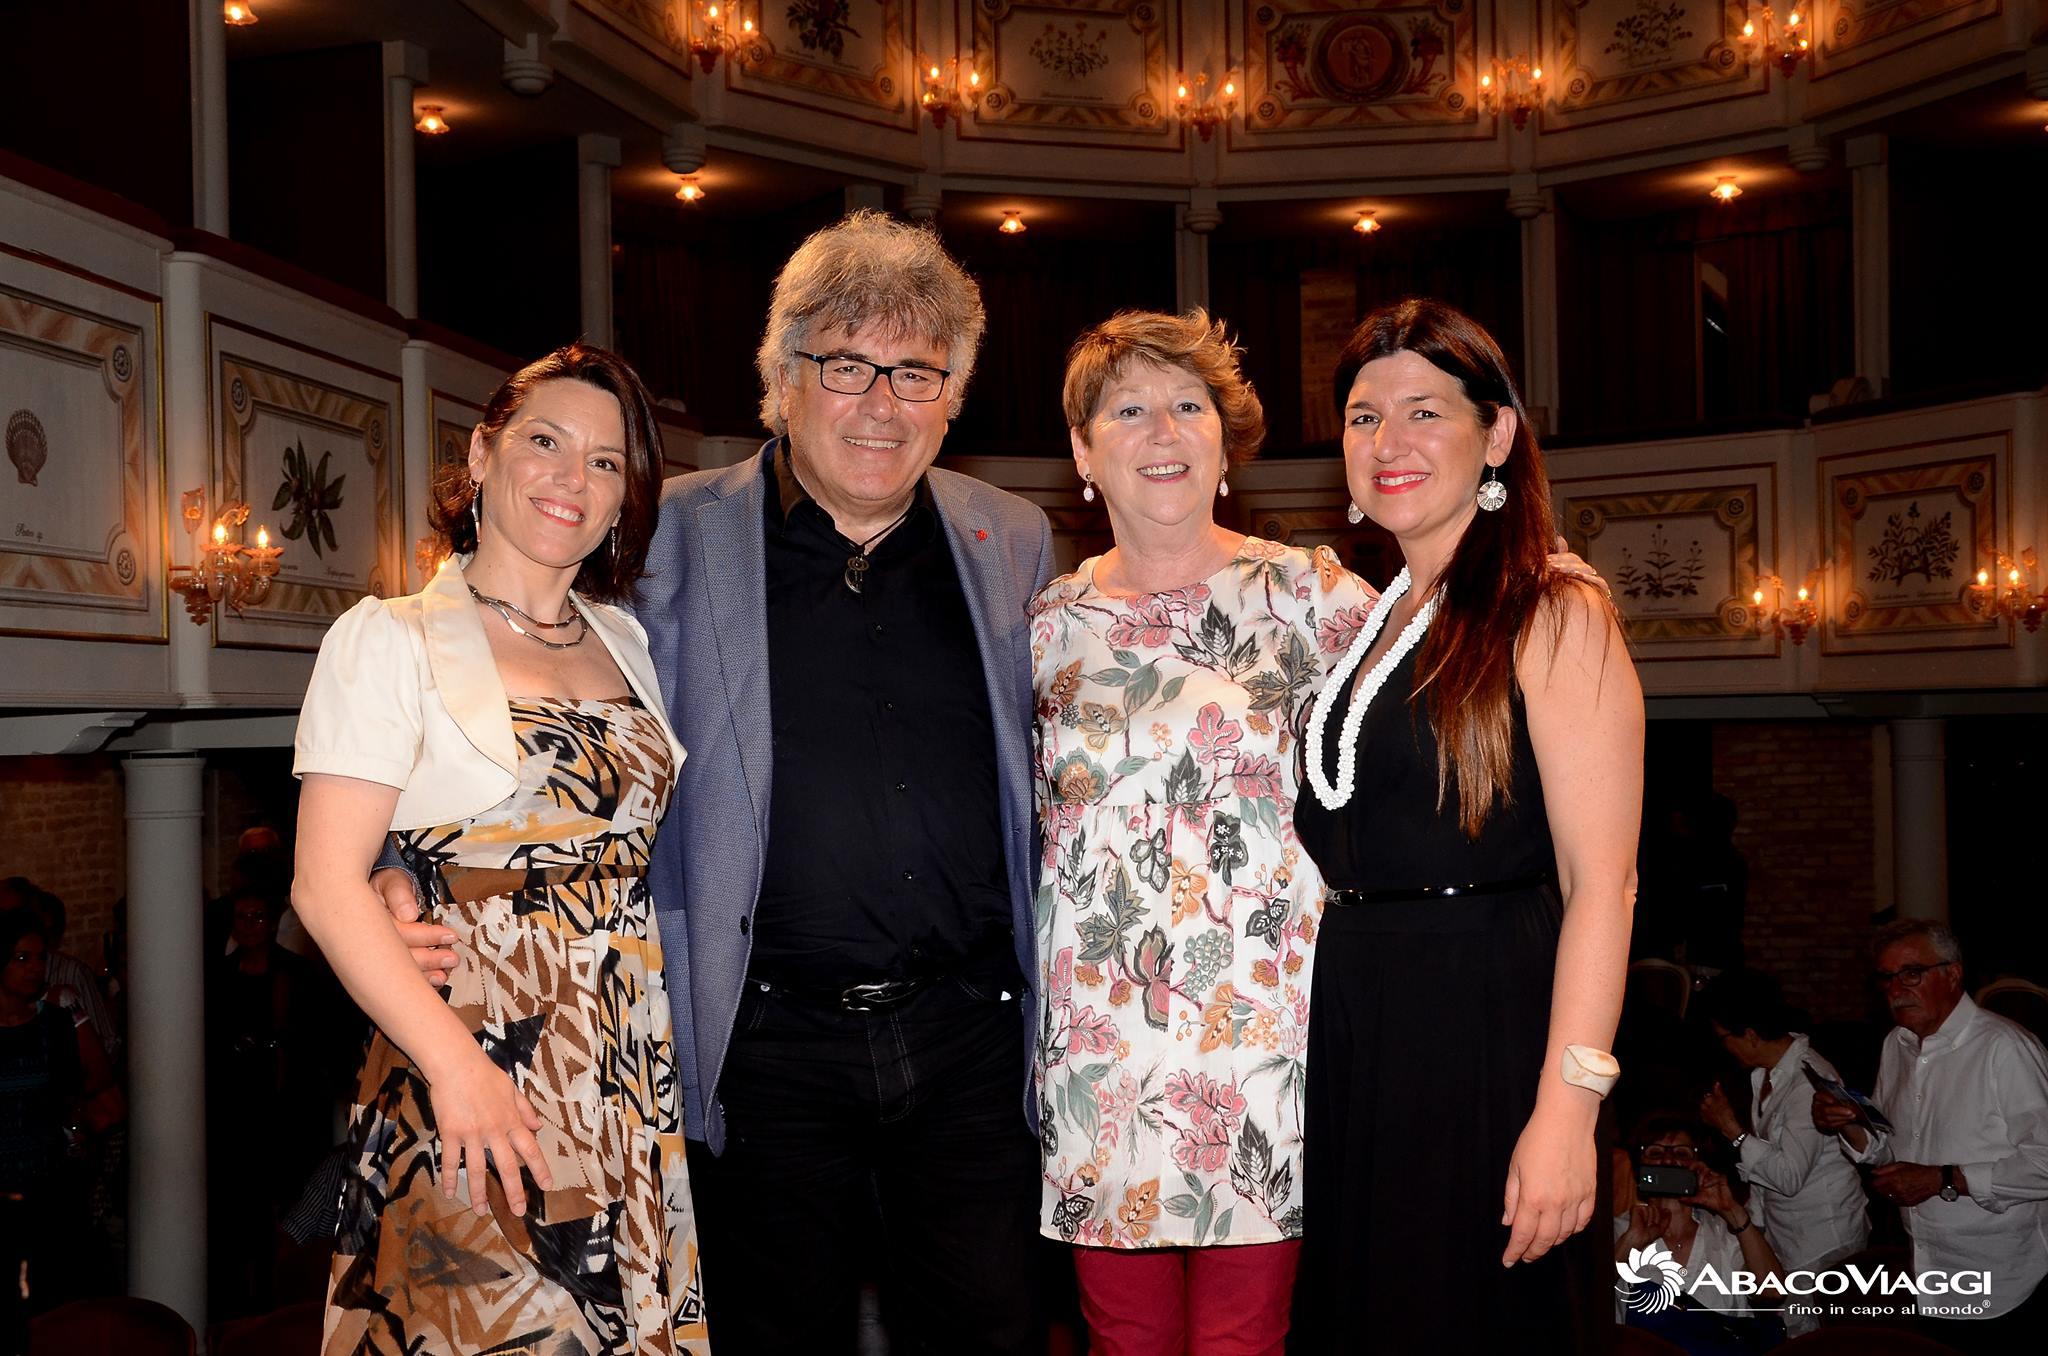 Teatro arrigoni di San Vito T (Pn) – 31 mag 17